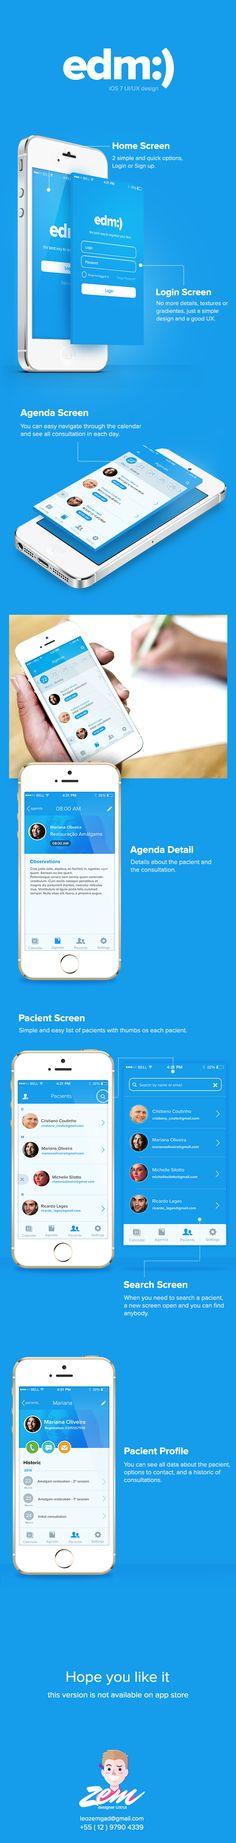 EDM - New mobile design by Leonardo Zem, via Behance